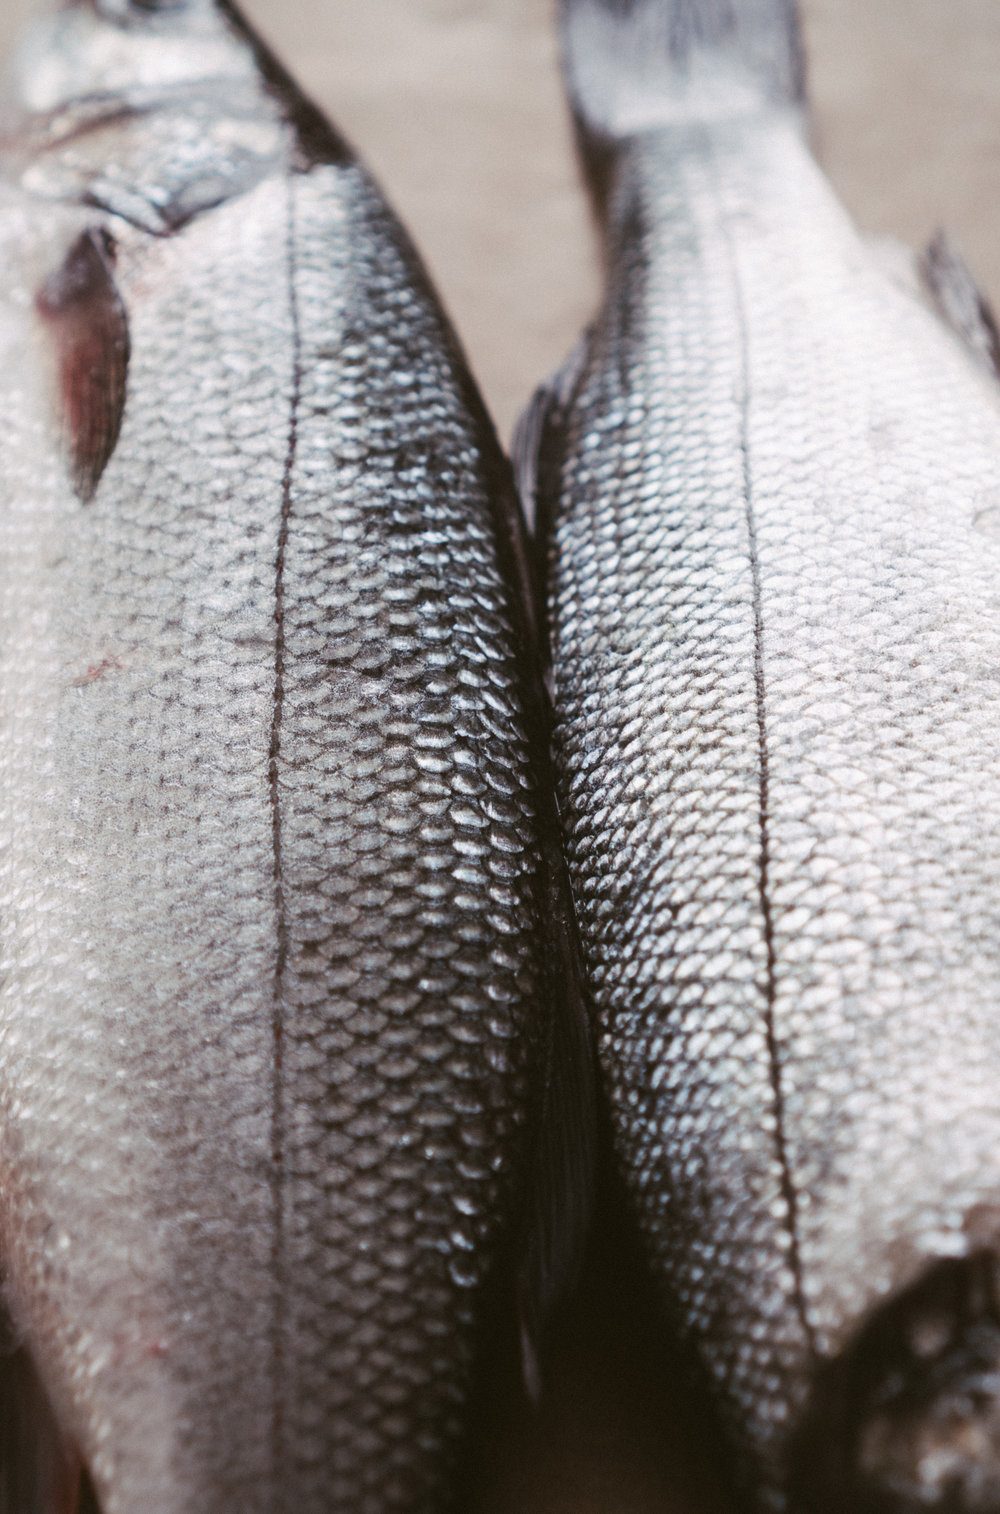 easy_oven_roasted_sea_bass-4.jpg